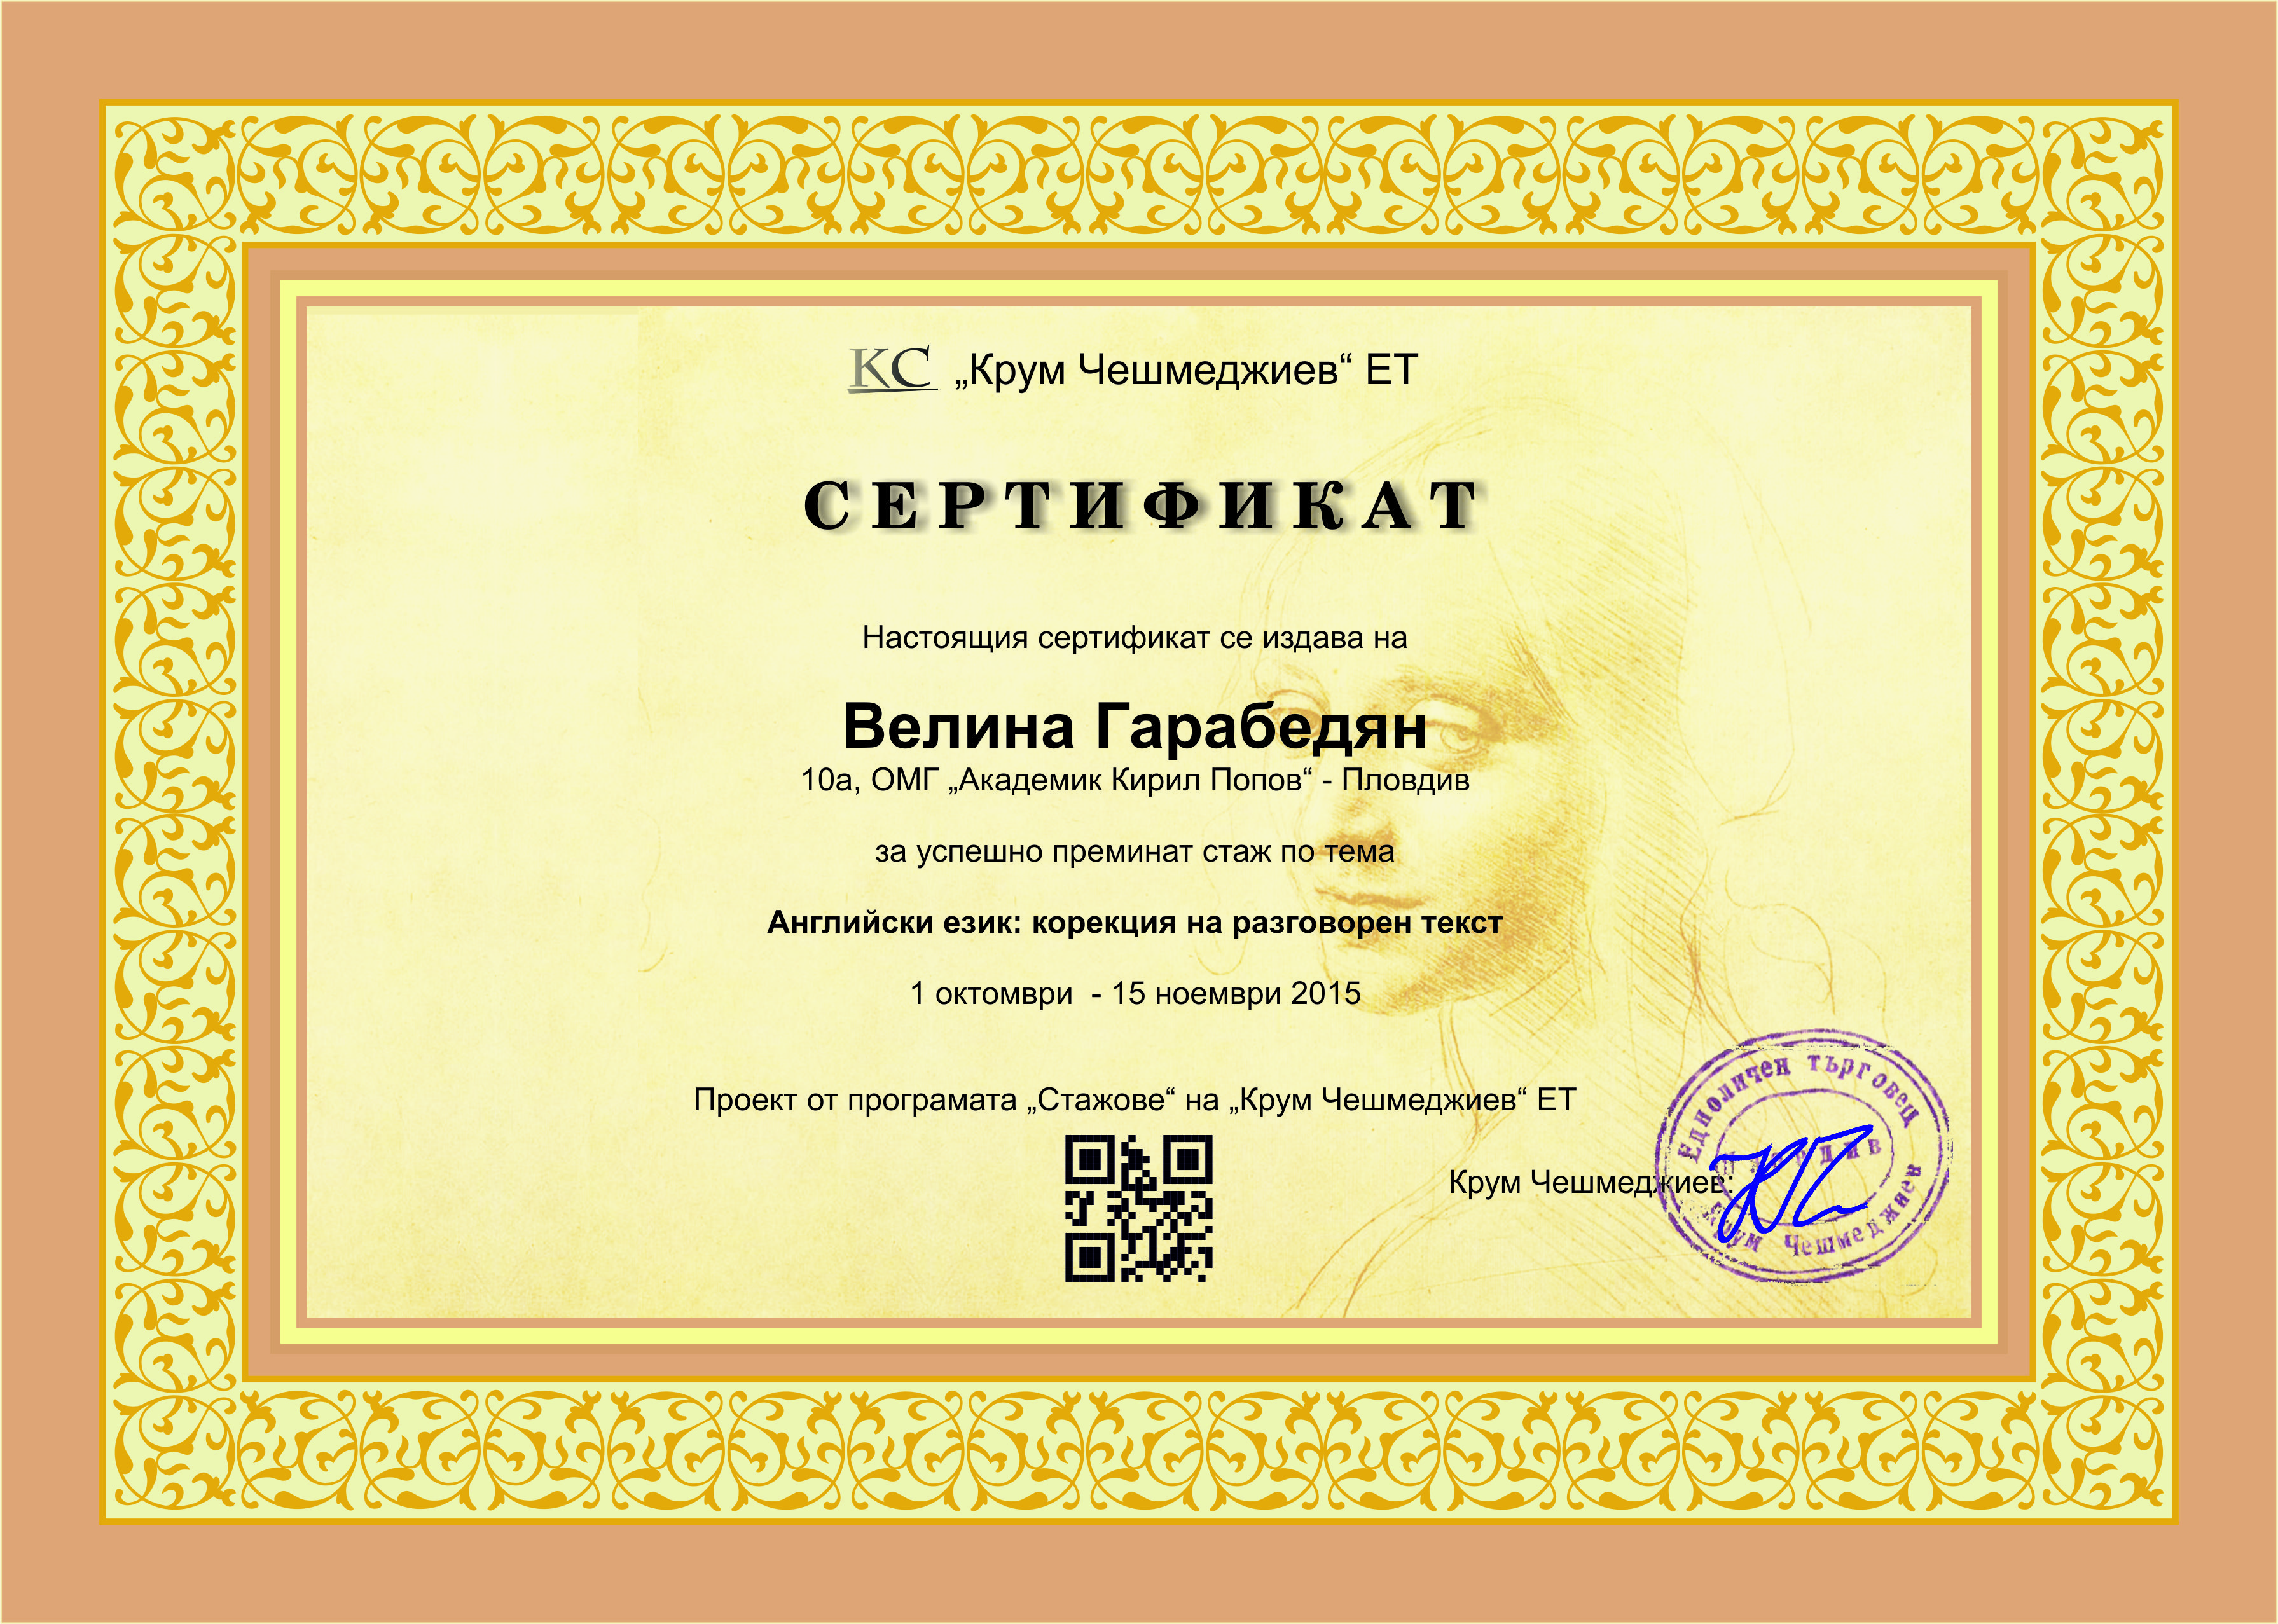 Велина Гарабедян (сертификат)